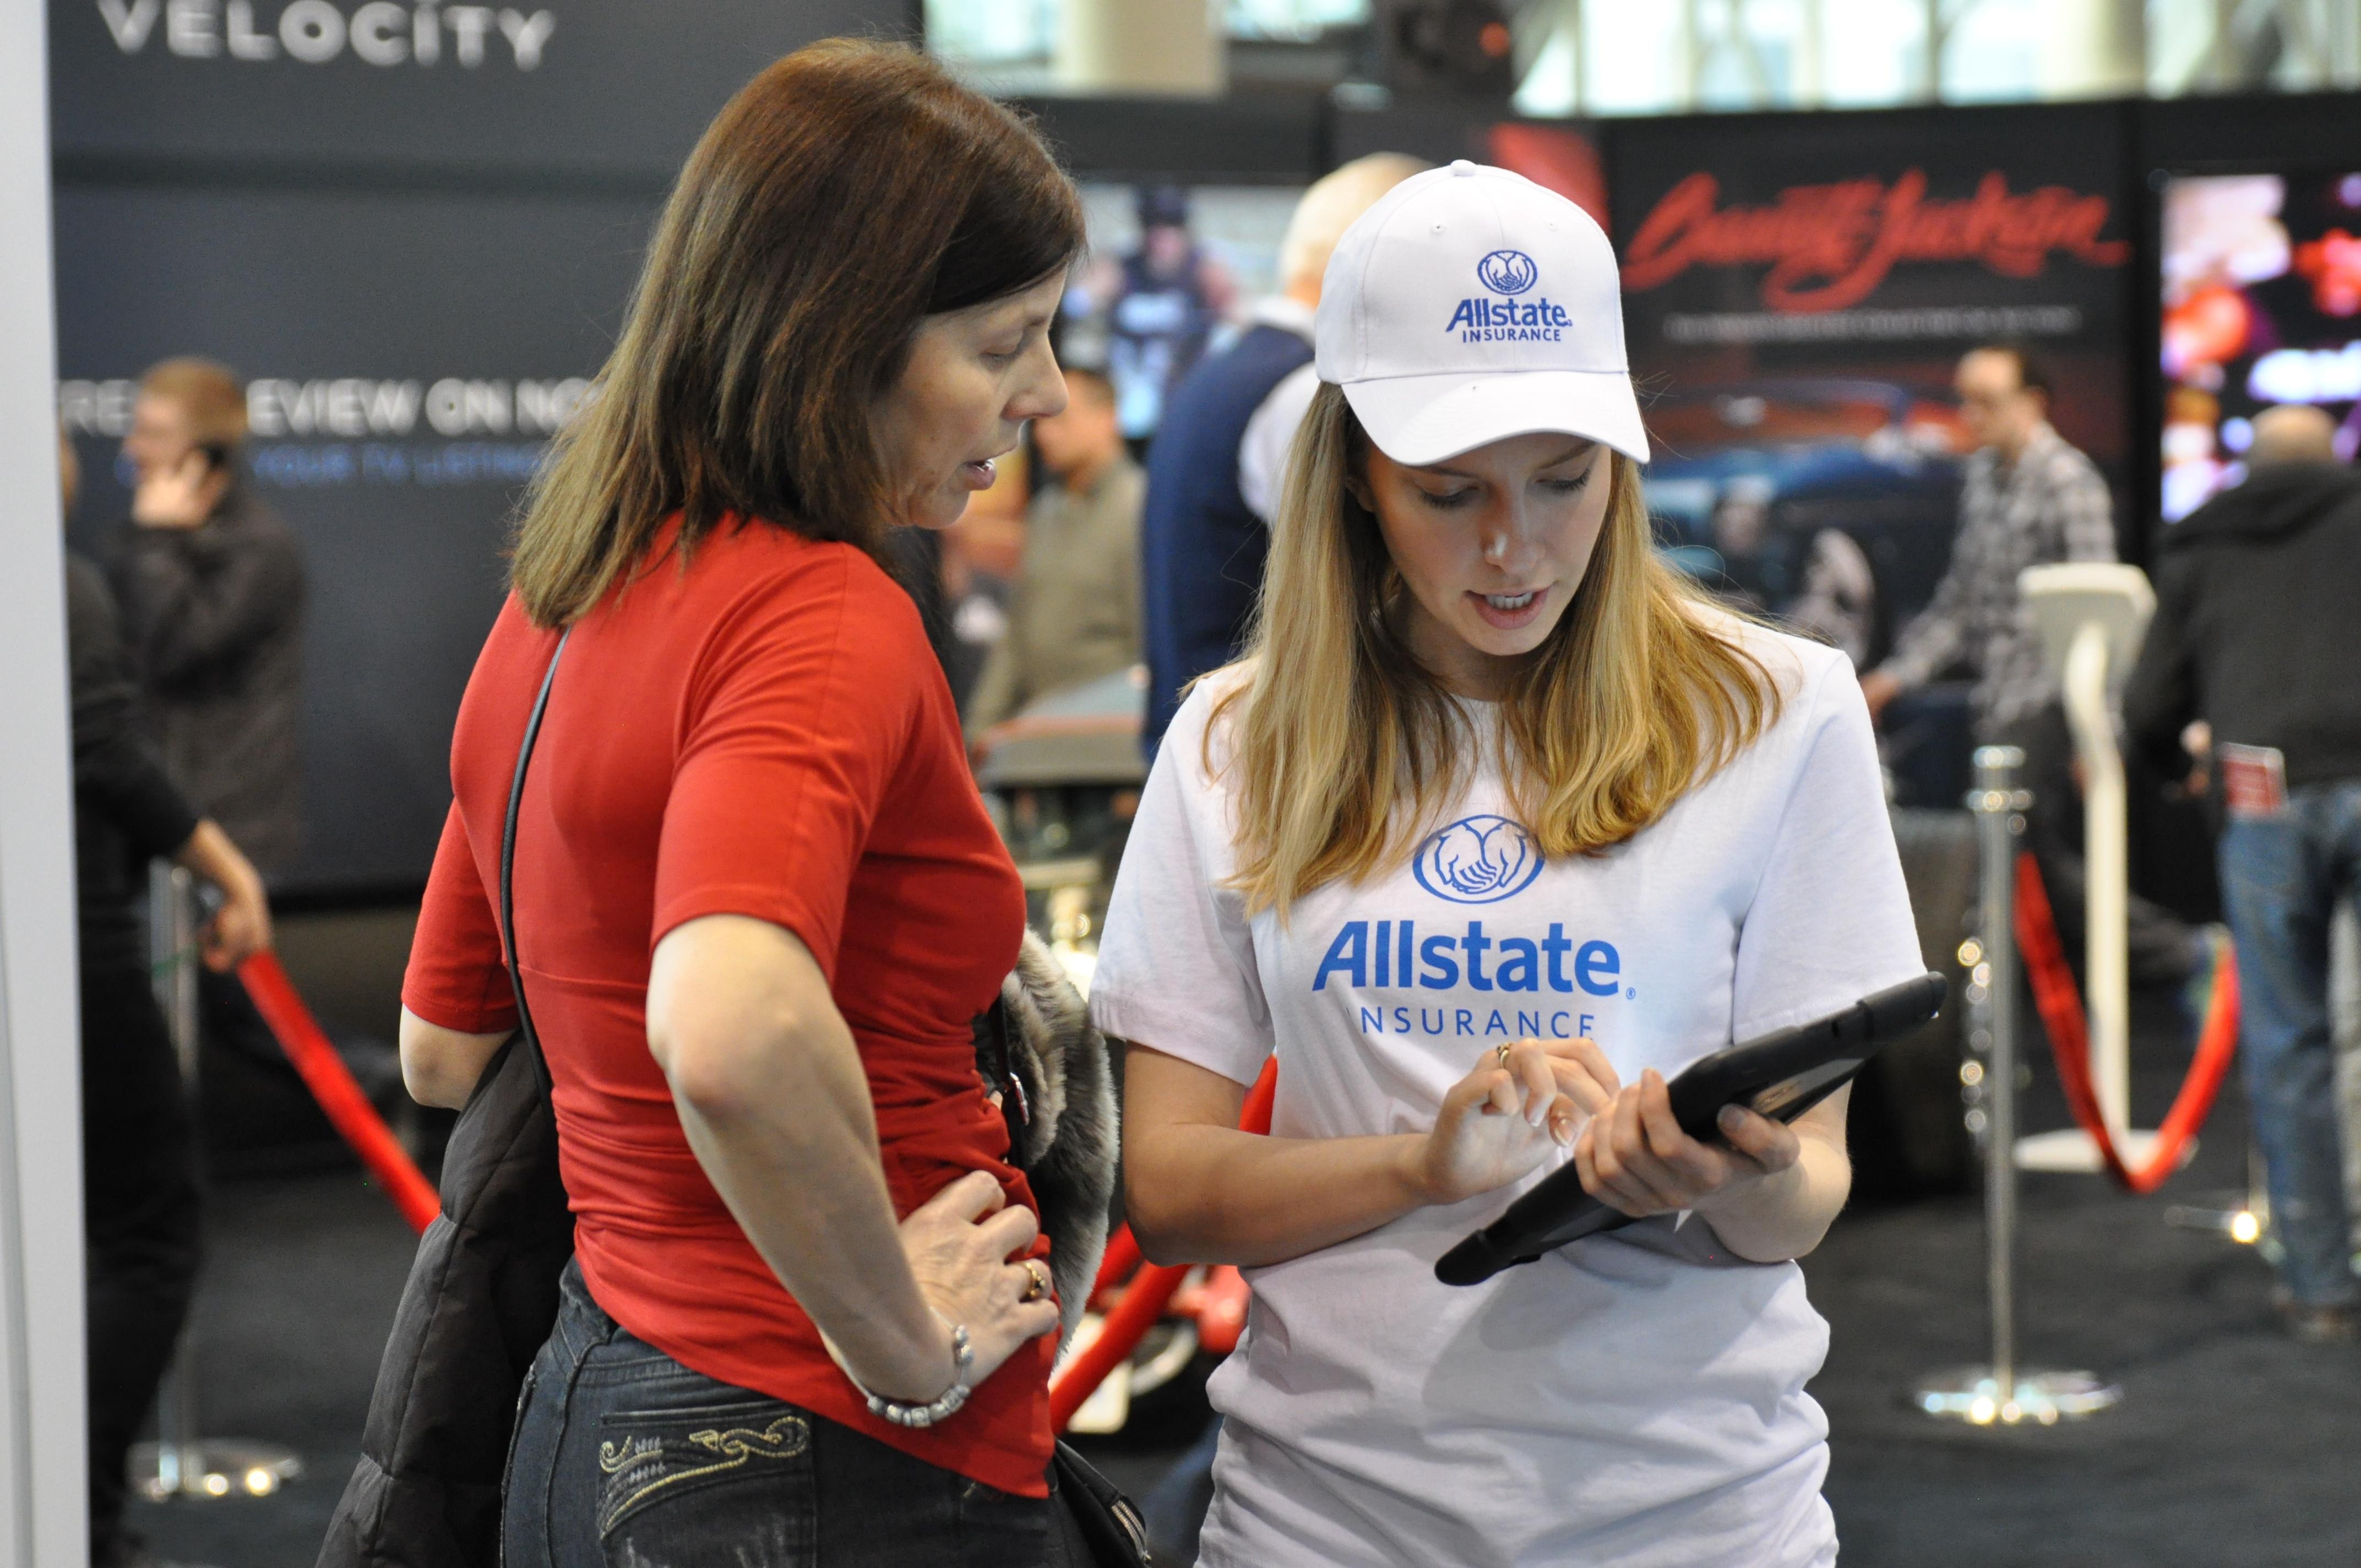 Allstate-case-study